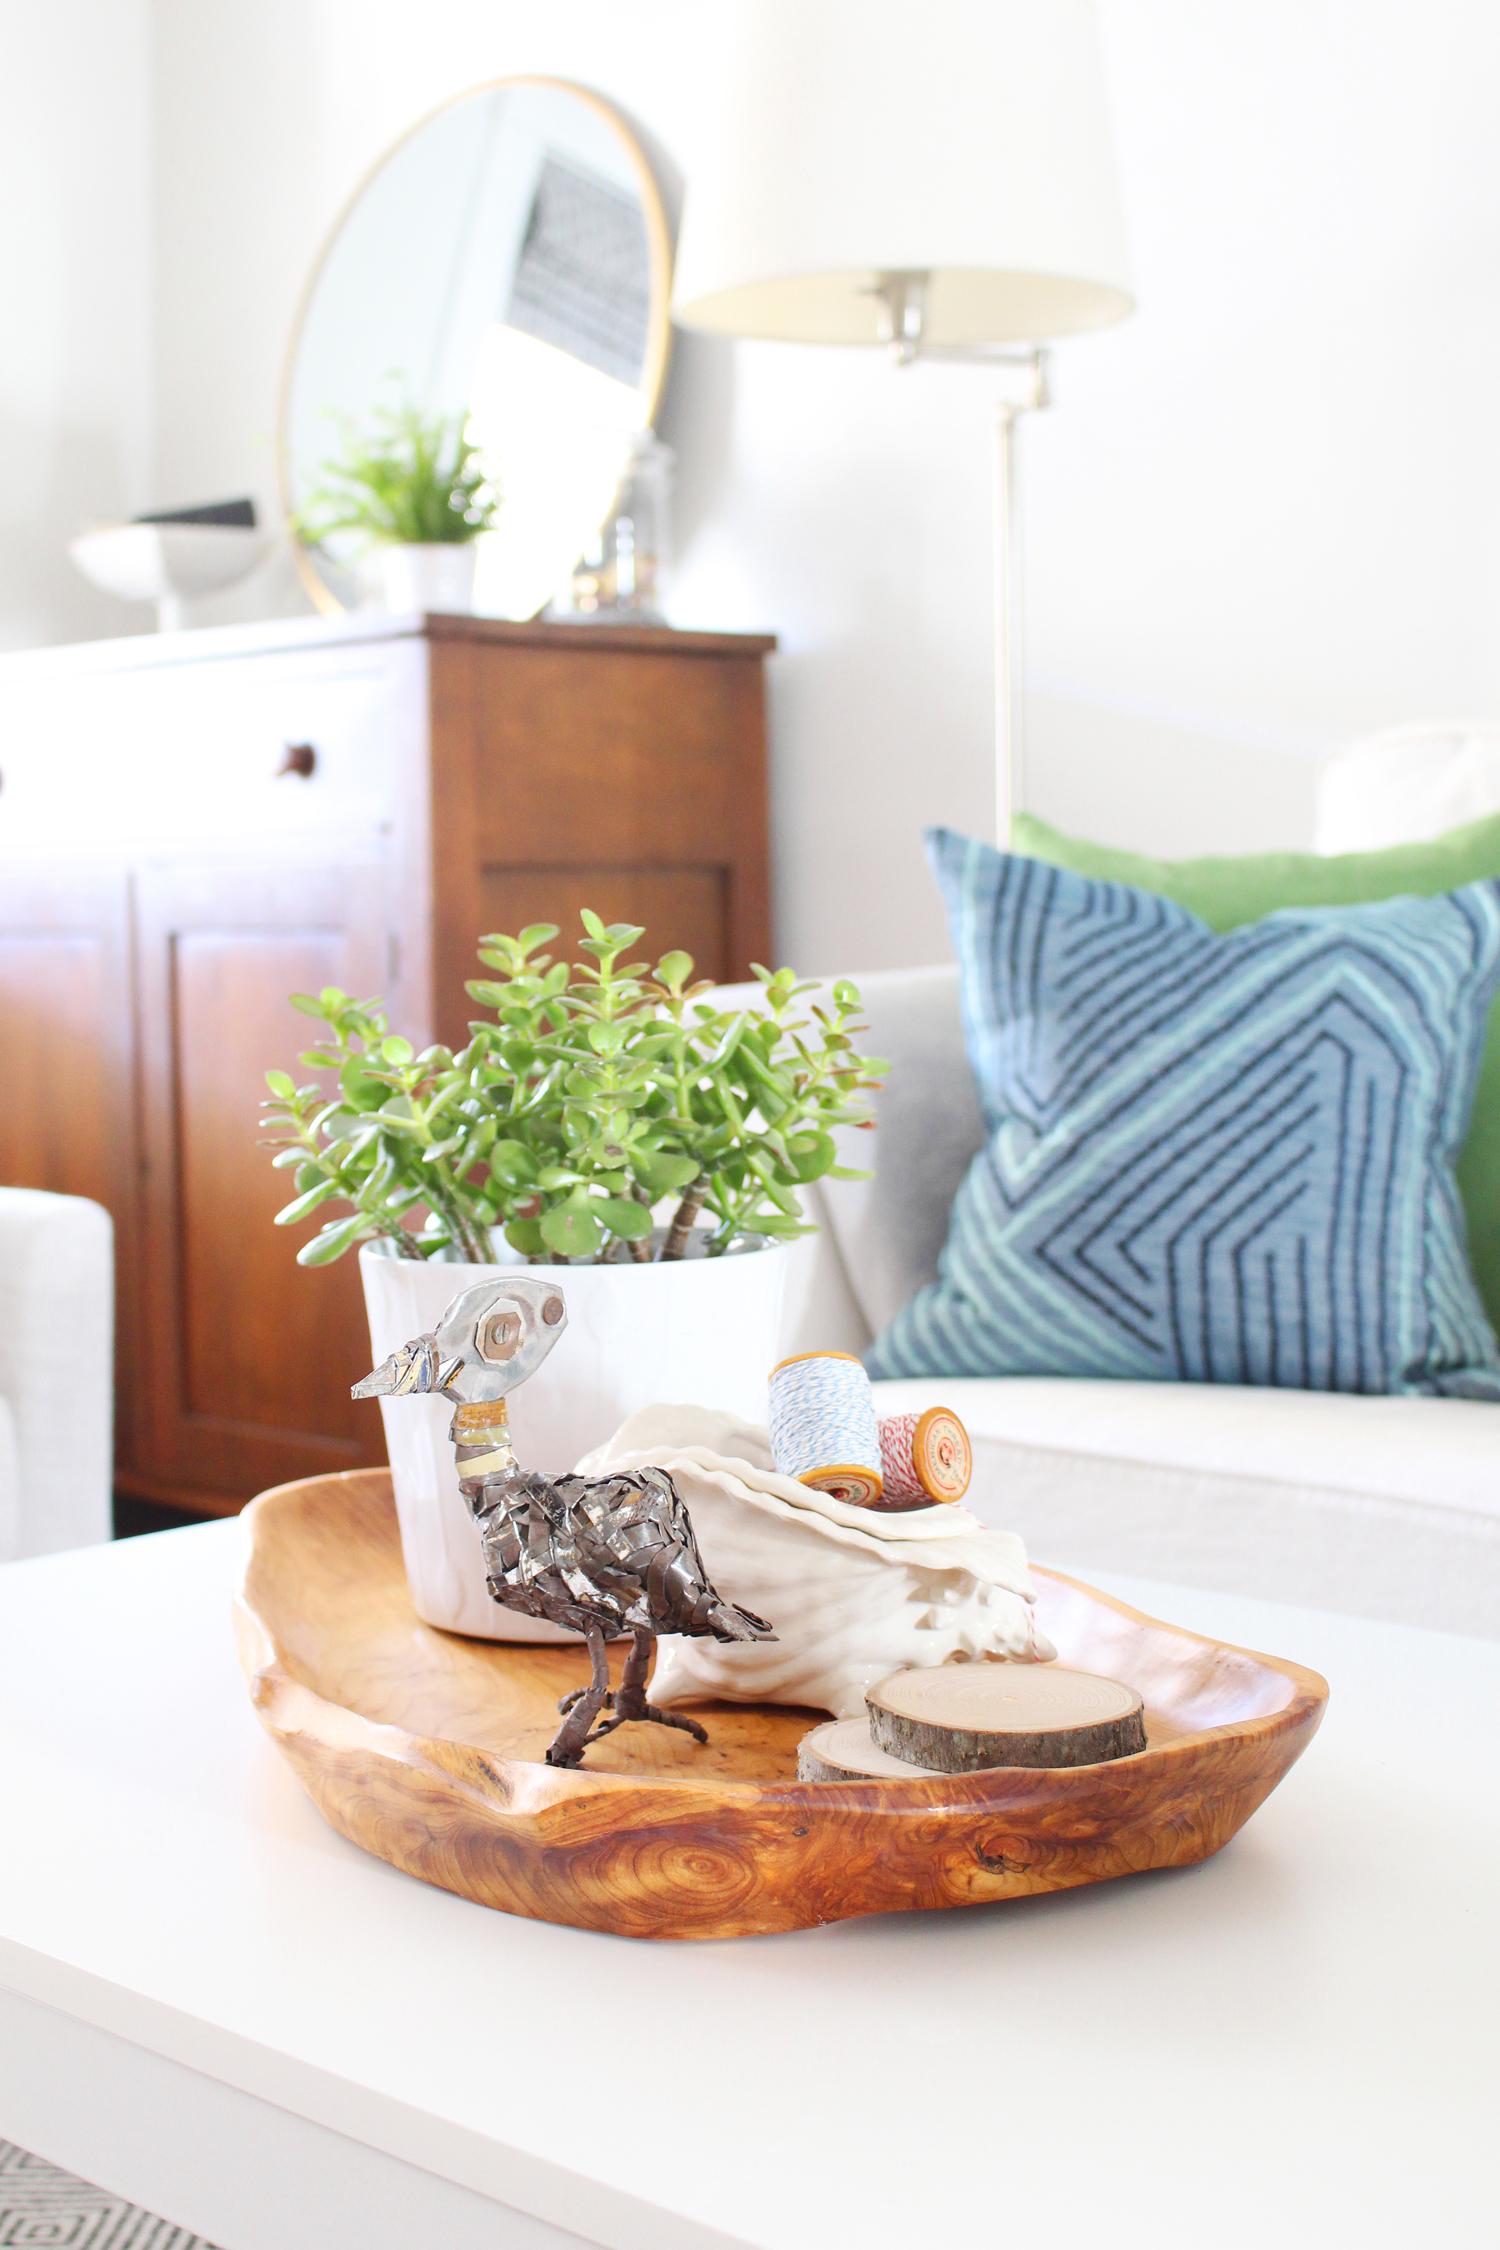 Eclectic-Bright-White-Living-Room-17.jpg